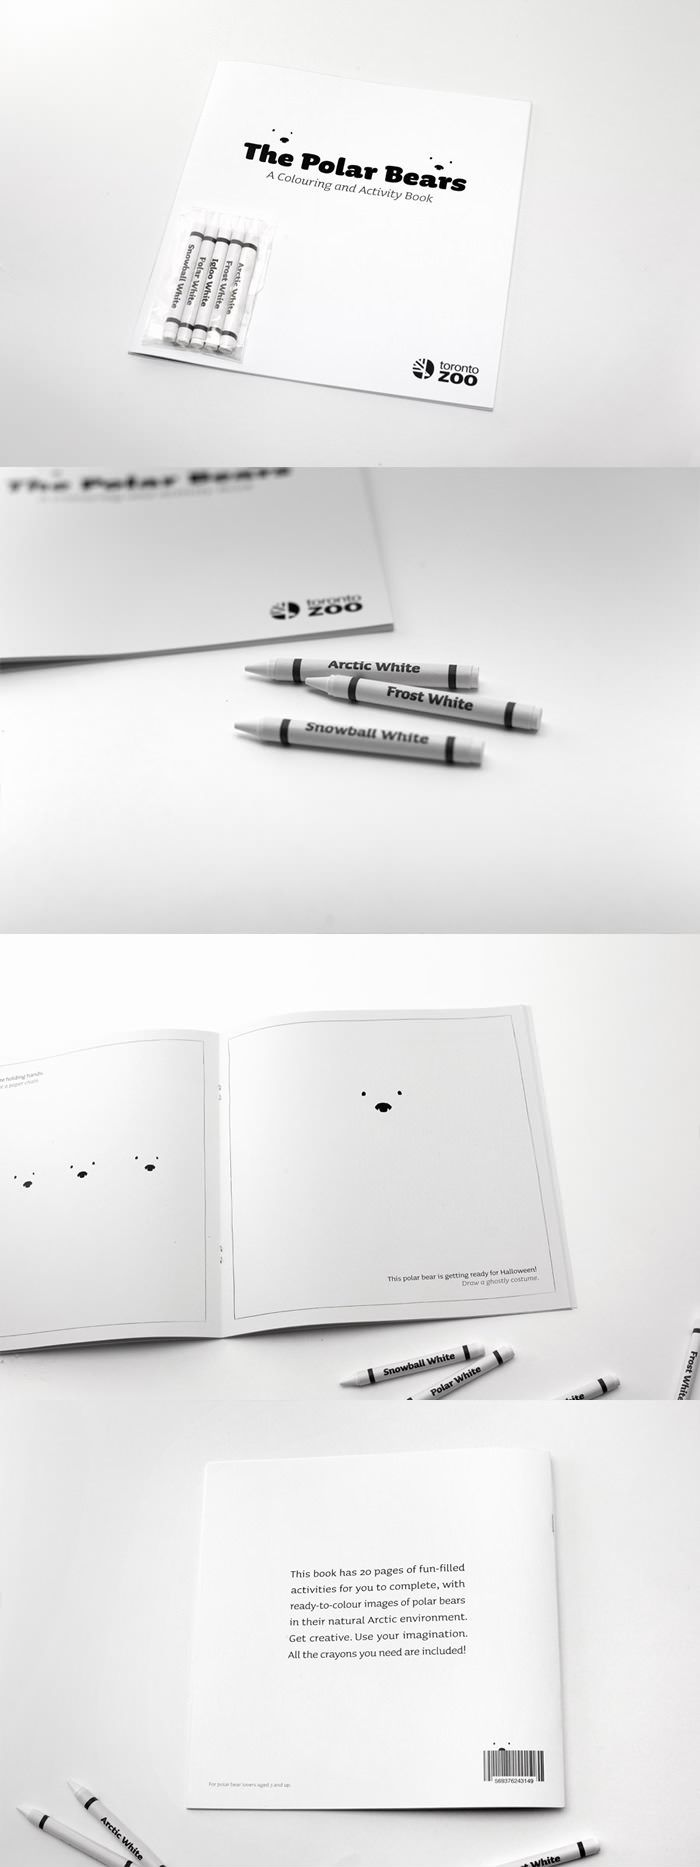 The Polar Bears - A Colouring and Activity Book